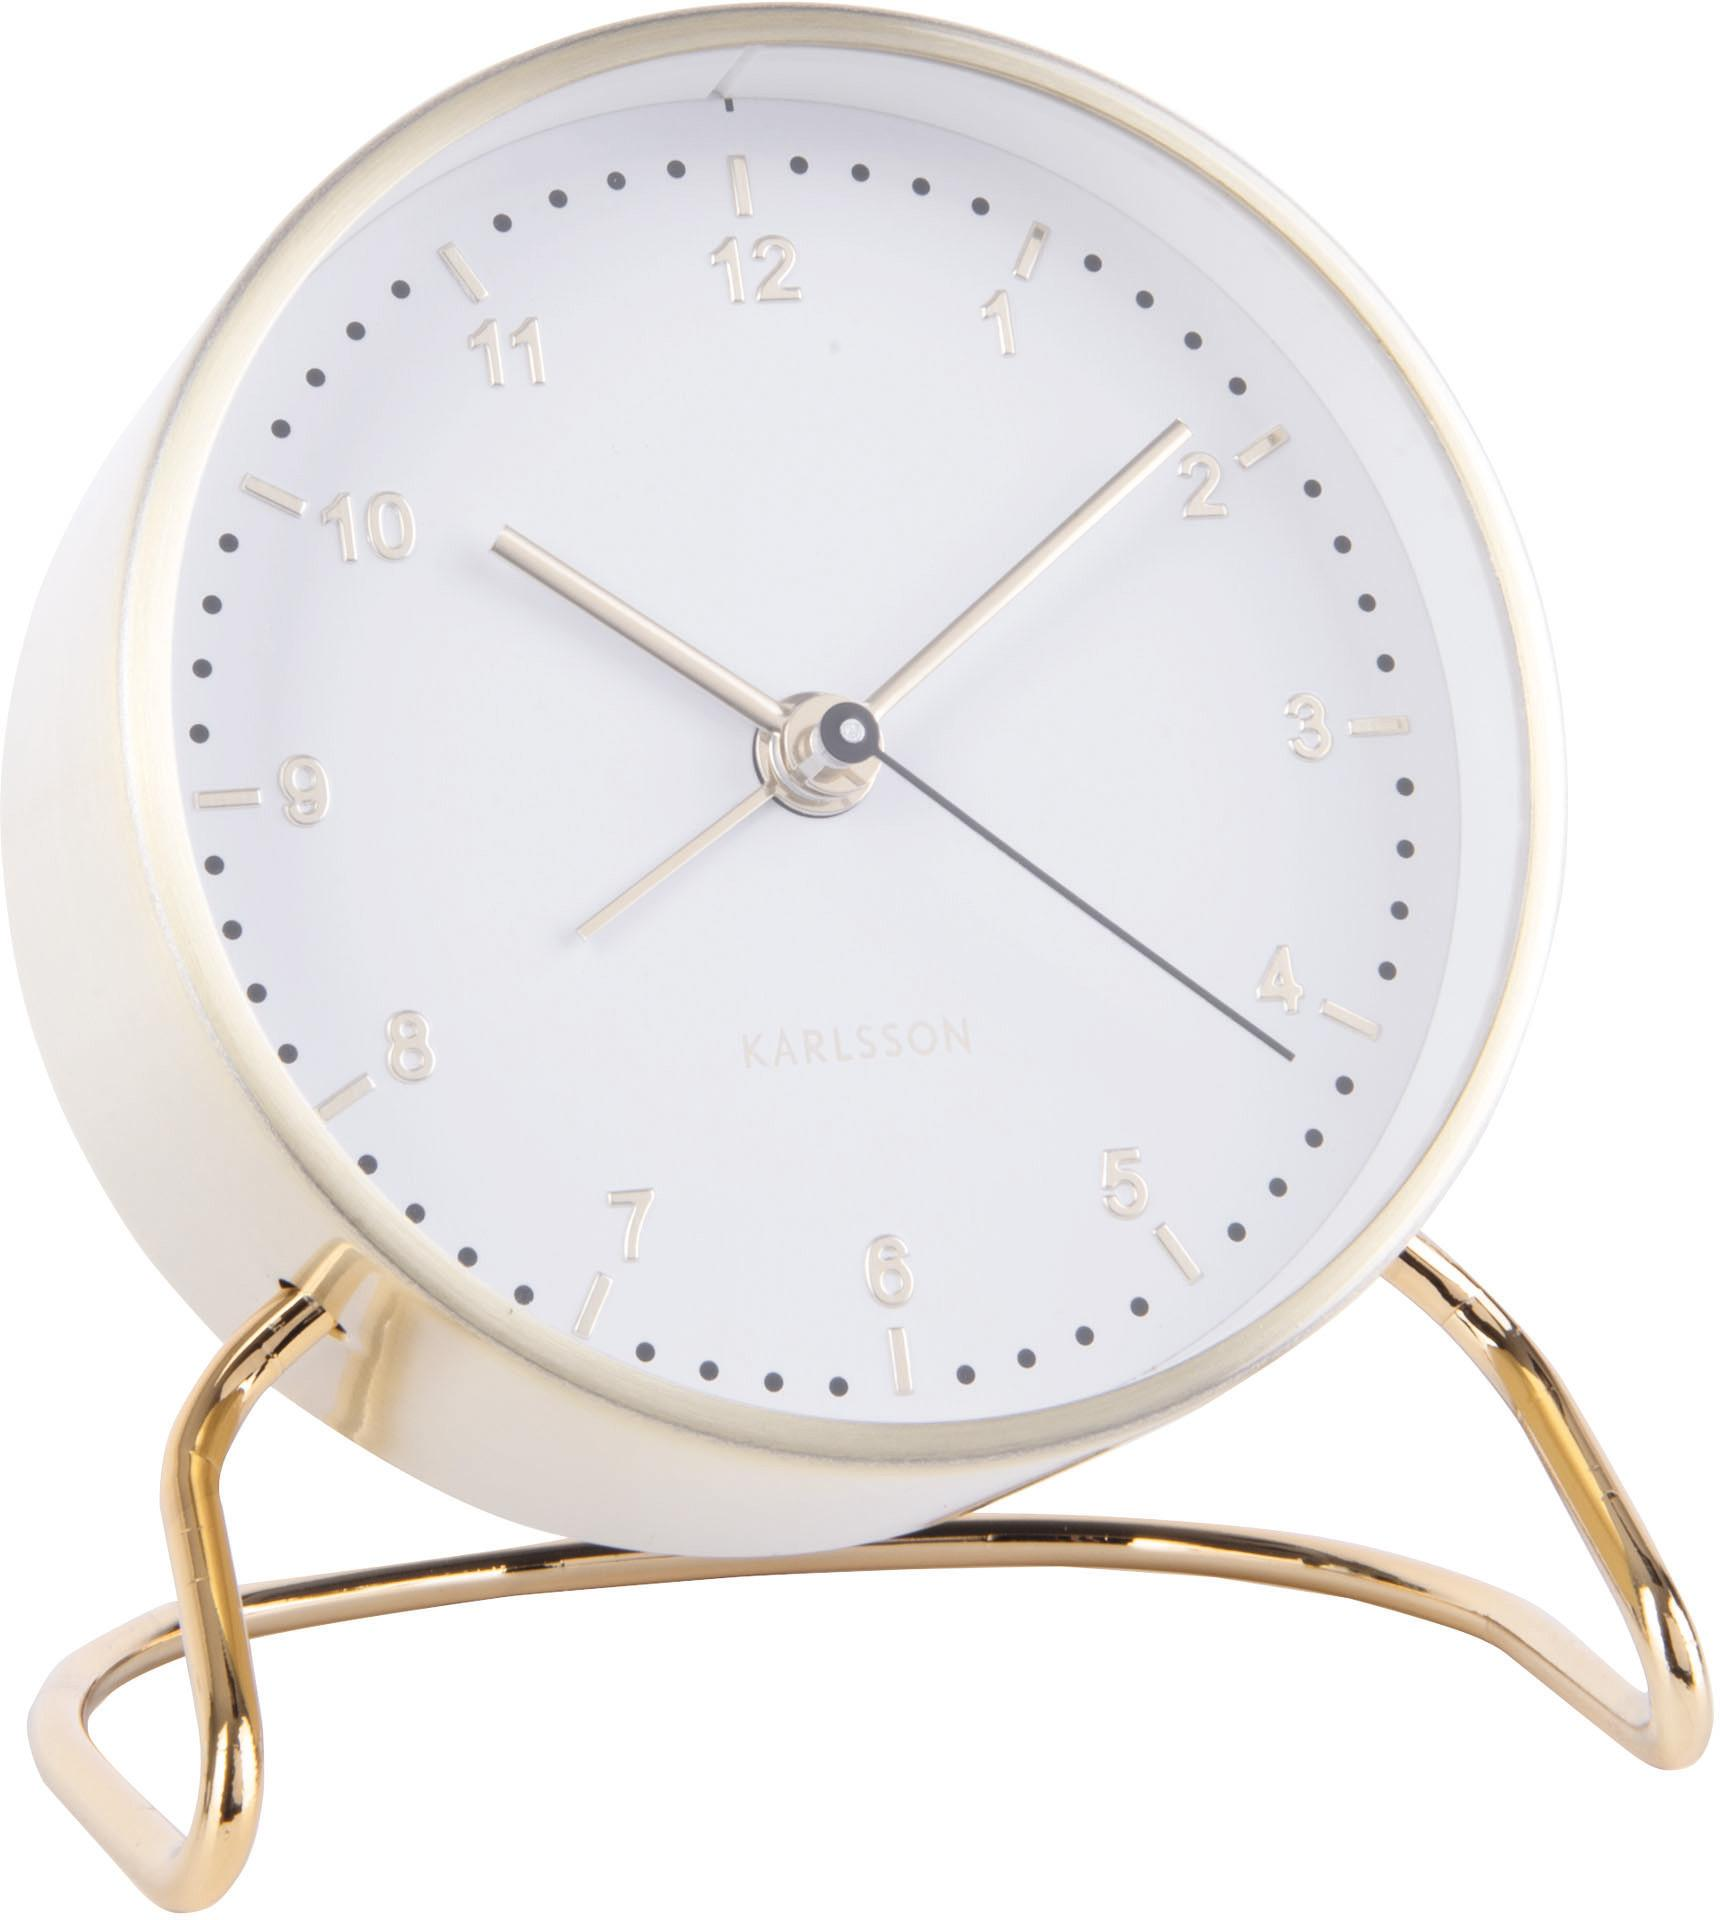 Despertador Stylish, Metal recubierto, Blanco, latón, Ø 9 cm